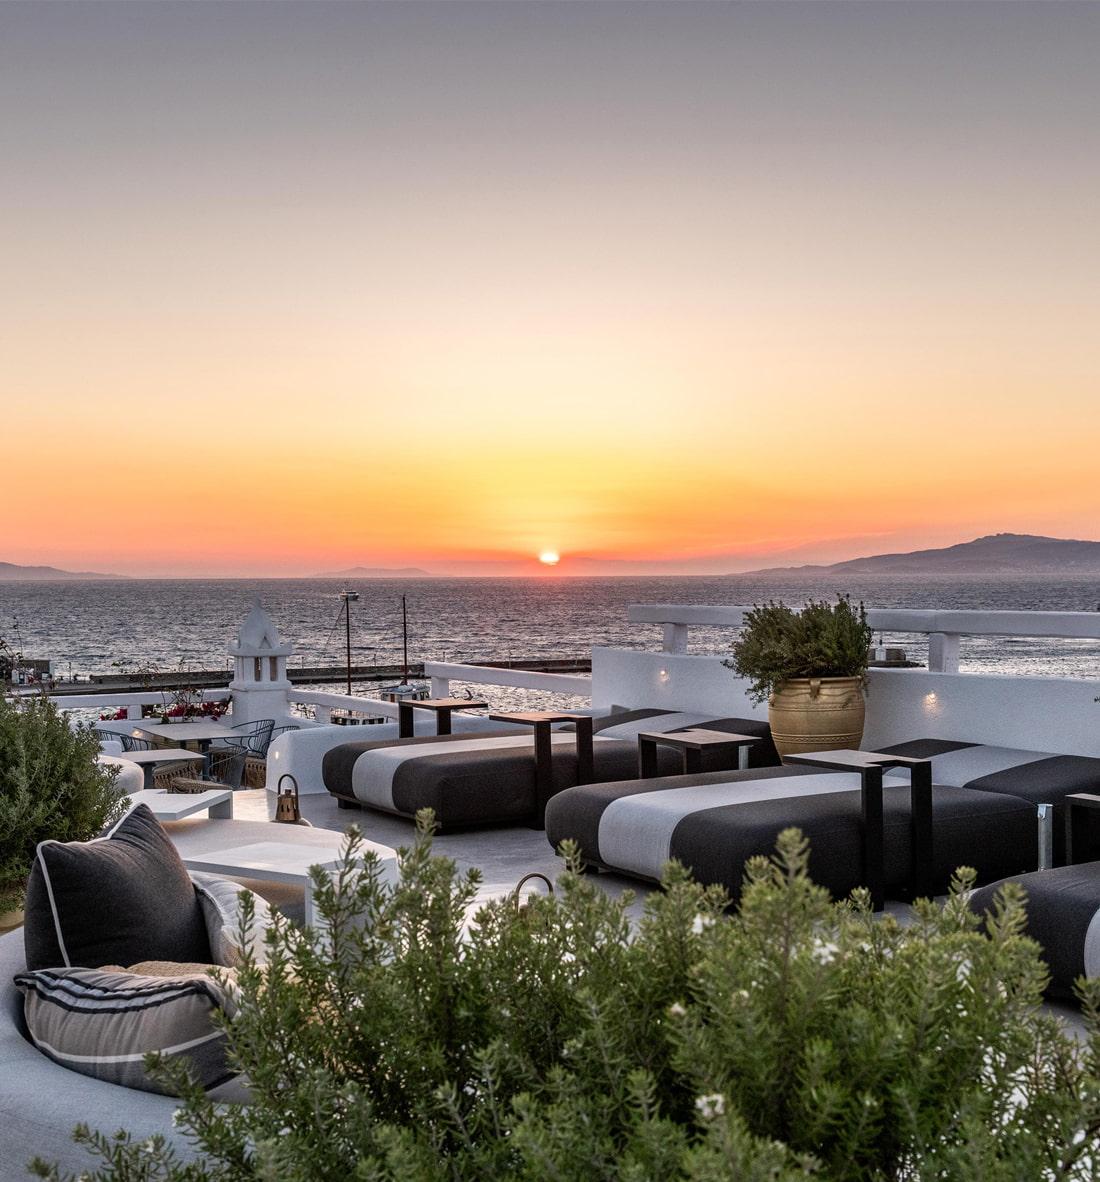 Designer hotel in Mykonos